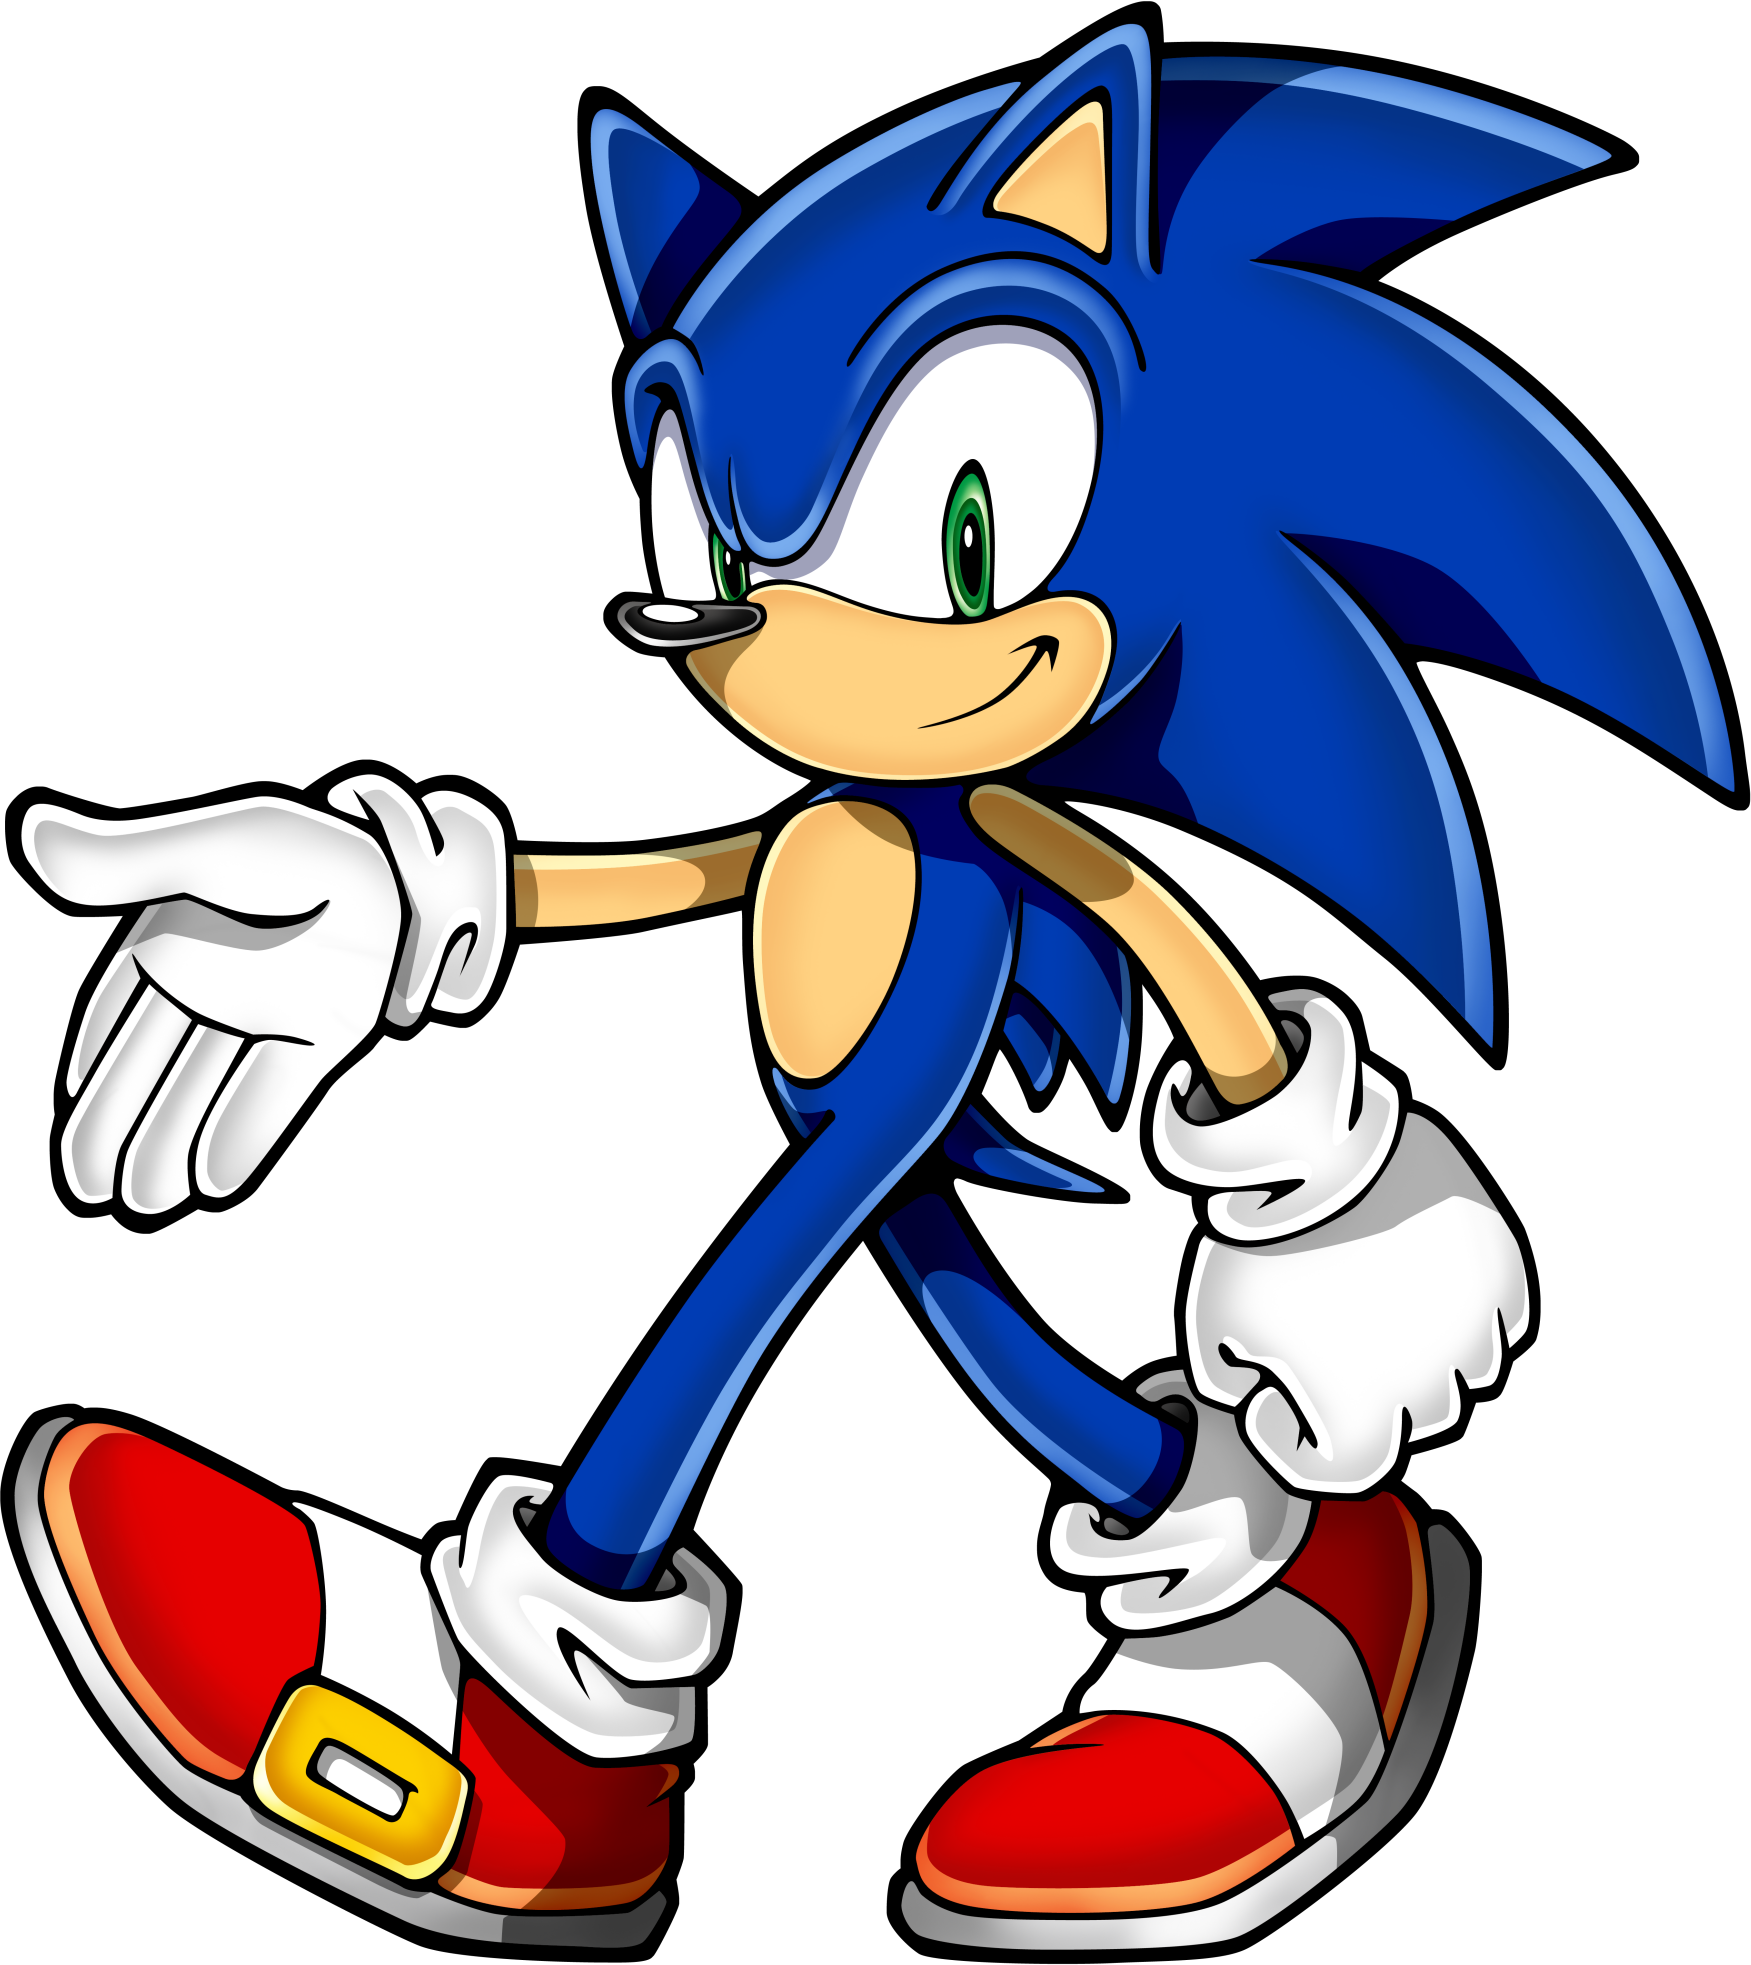 Sonic Art Assets DVD - Sonic The Hedgehog - 2.png